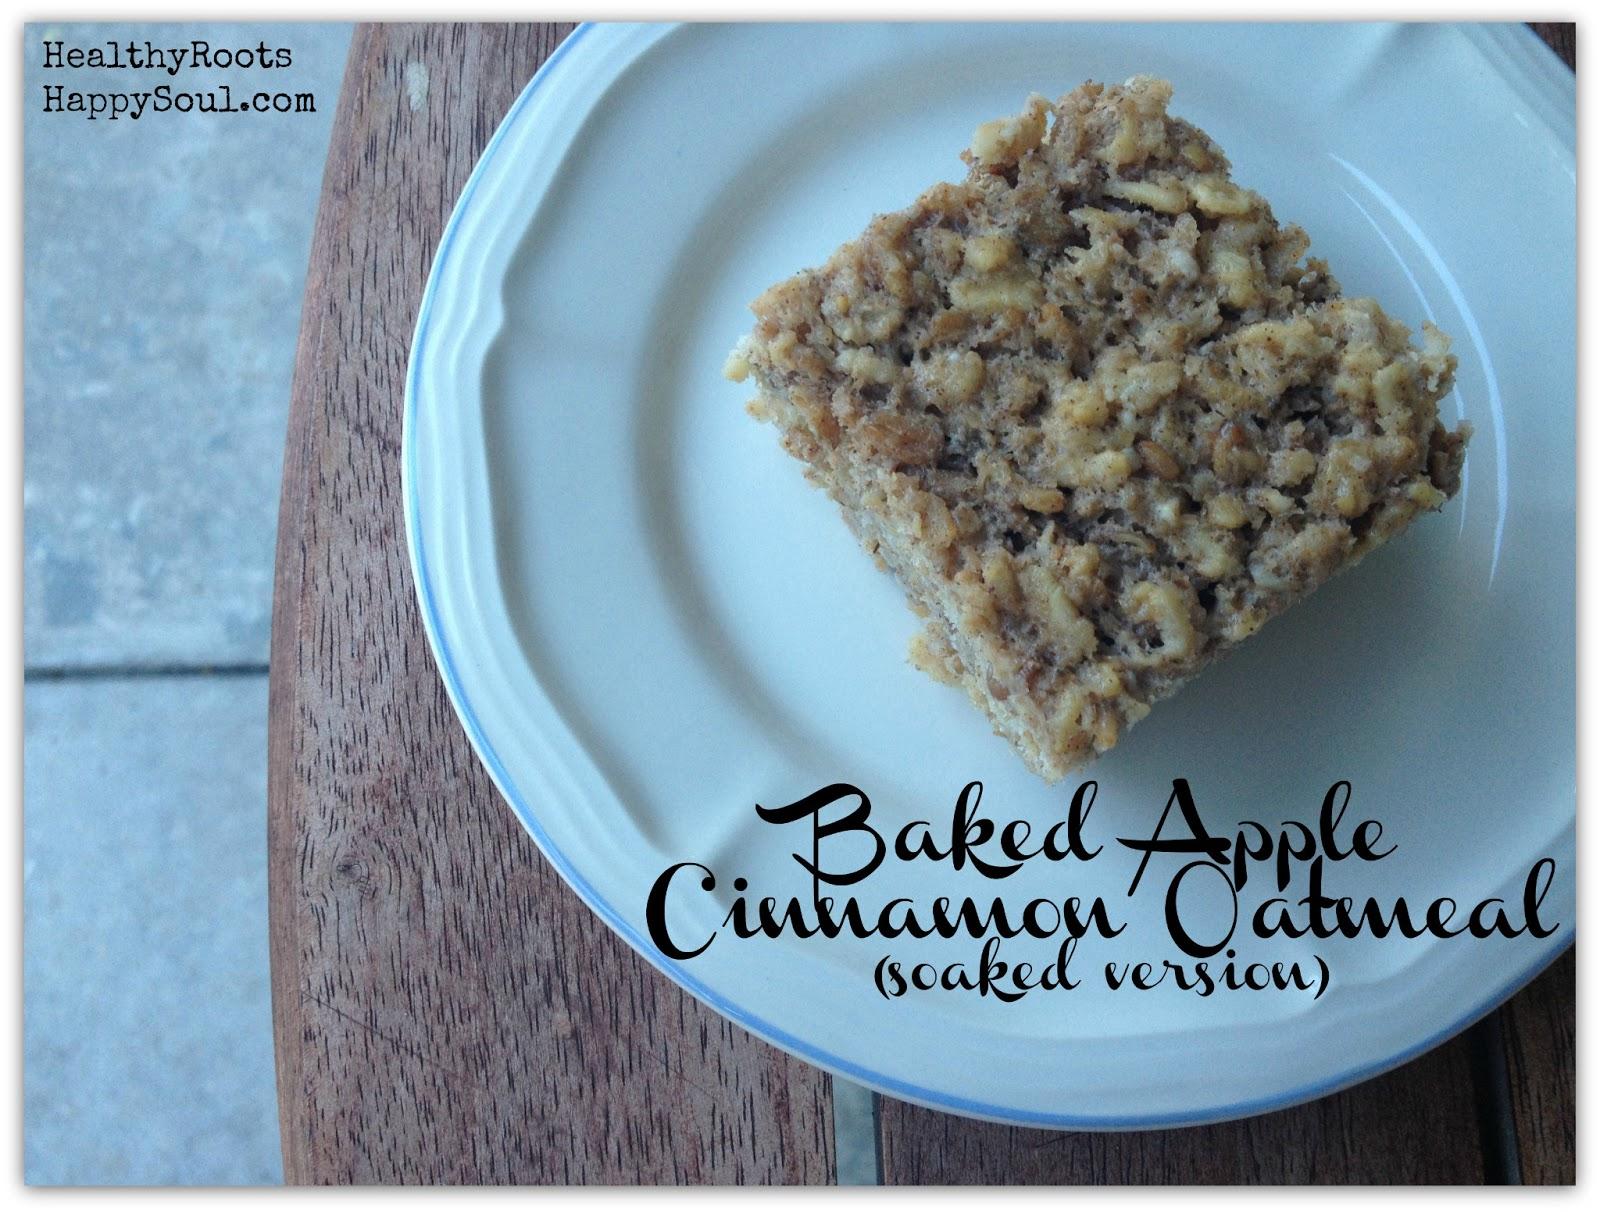 baked+apple+cinnamon+oatmeal.jpg